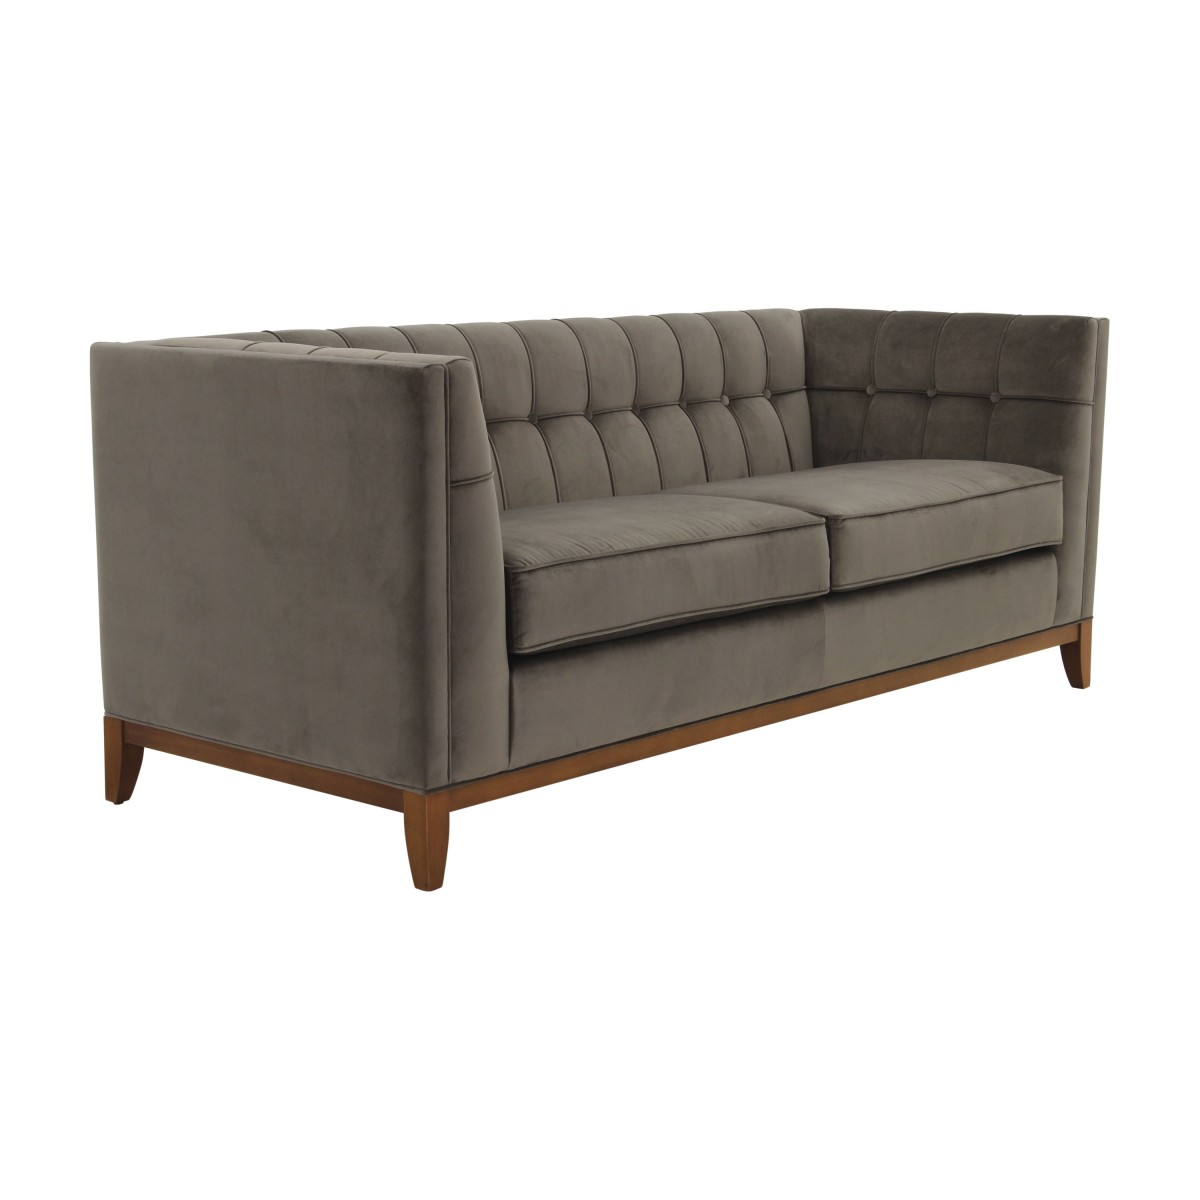 3 Seater sofa Lixis - Sevensedie